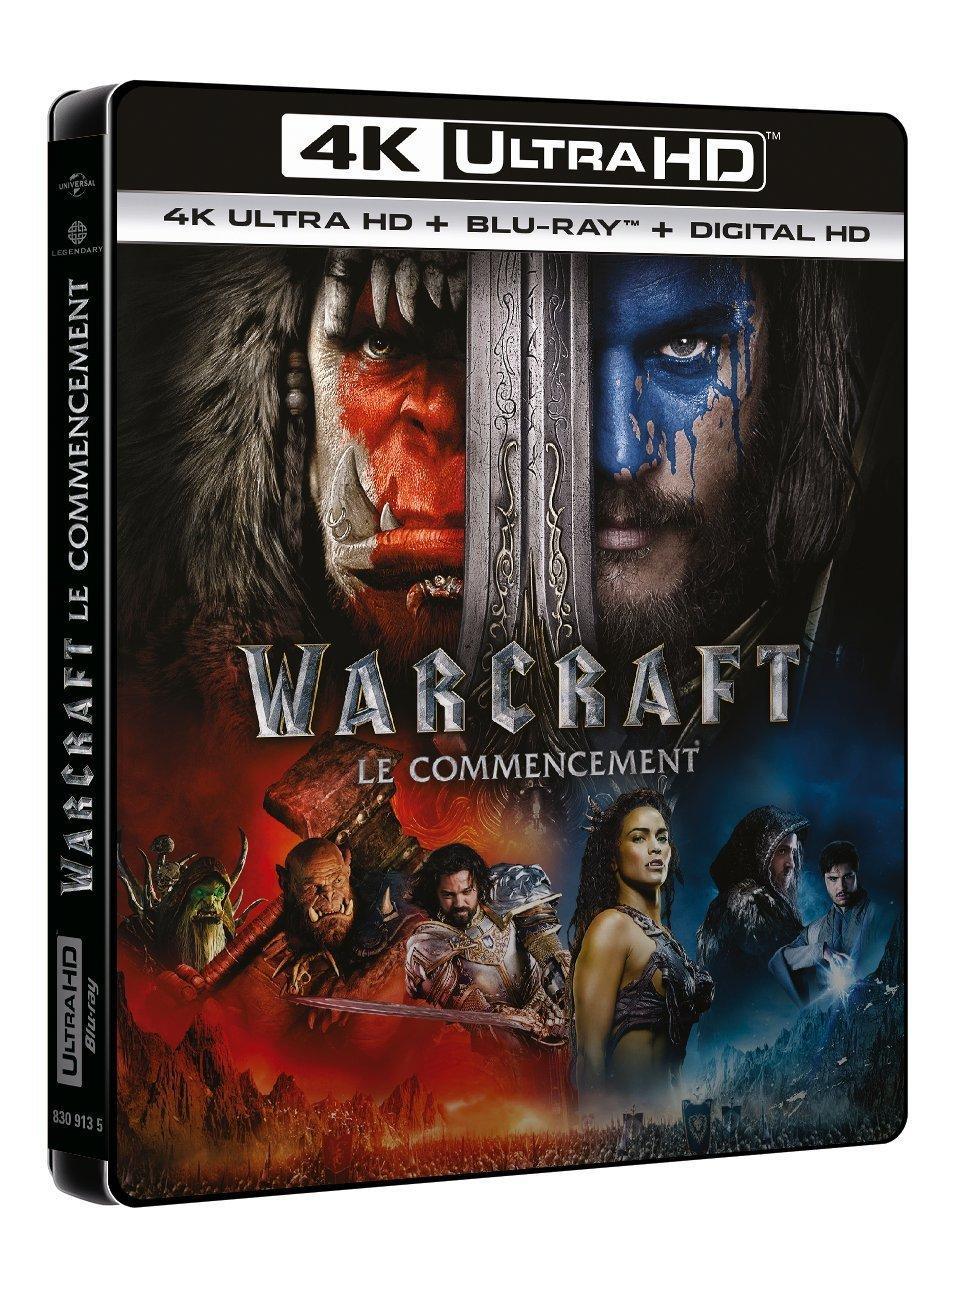 [Précommande] Blu-Ray 4K Ultra HD Warcraft : Le Commencement